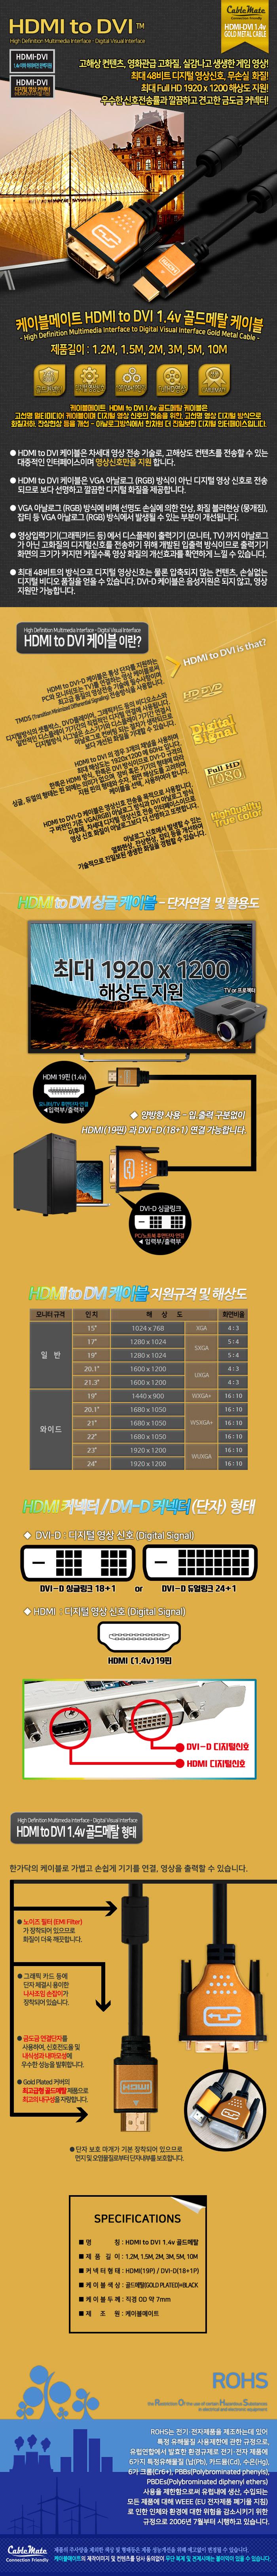 CABLEMATE HDMI to DVI Ver1.4 골드메탈 케이블 (3m)